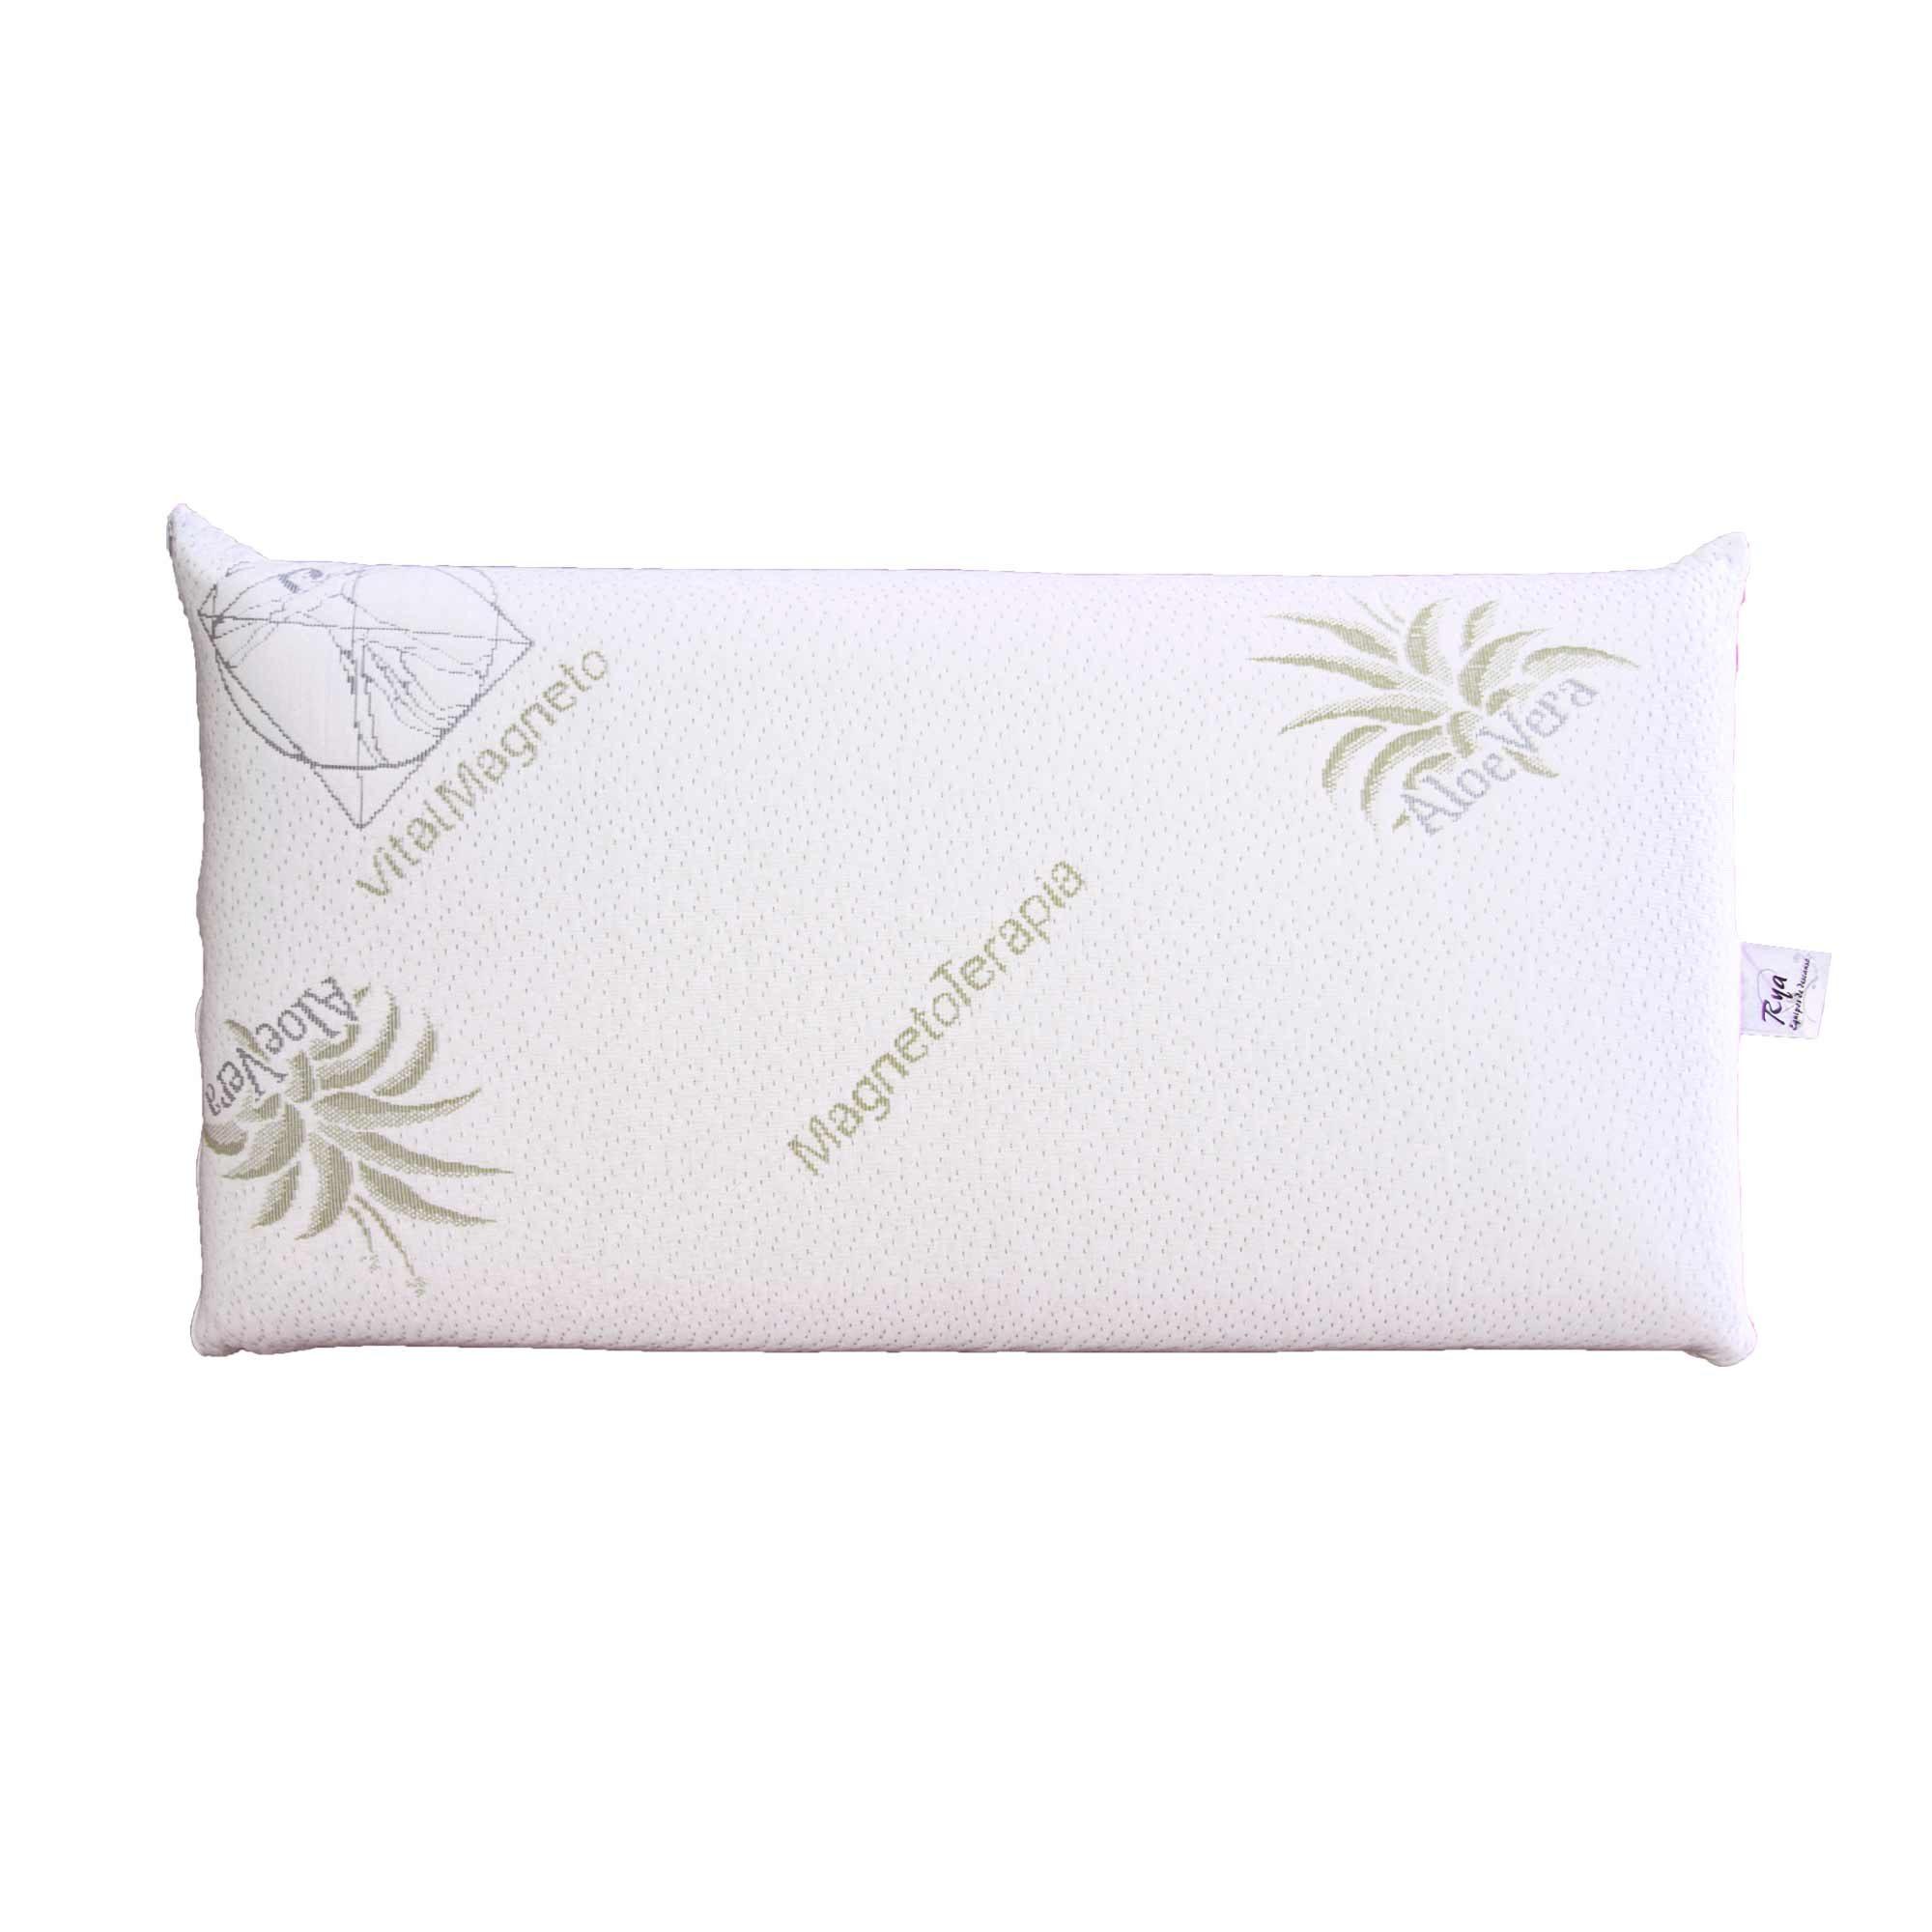 comprar almohada con aloe vera